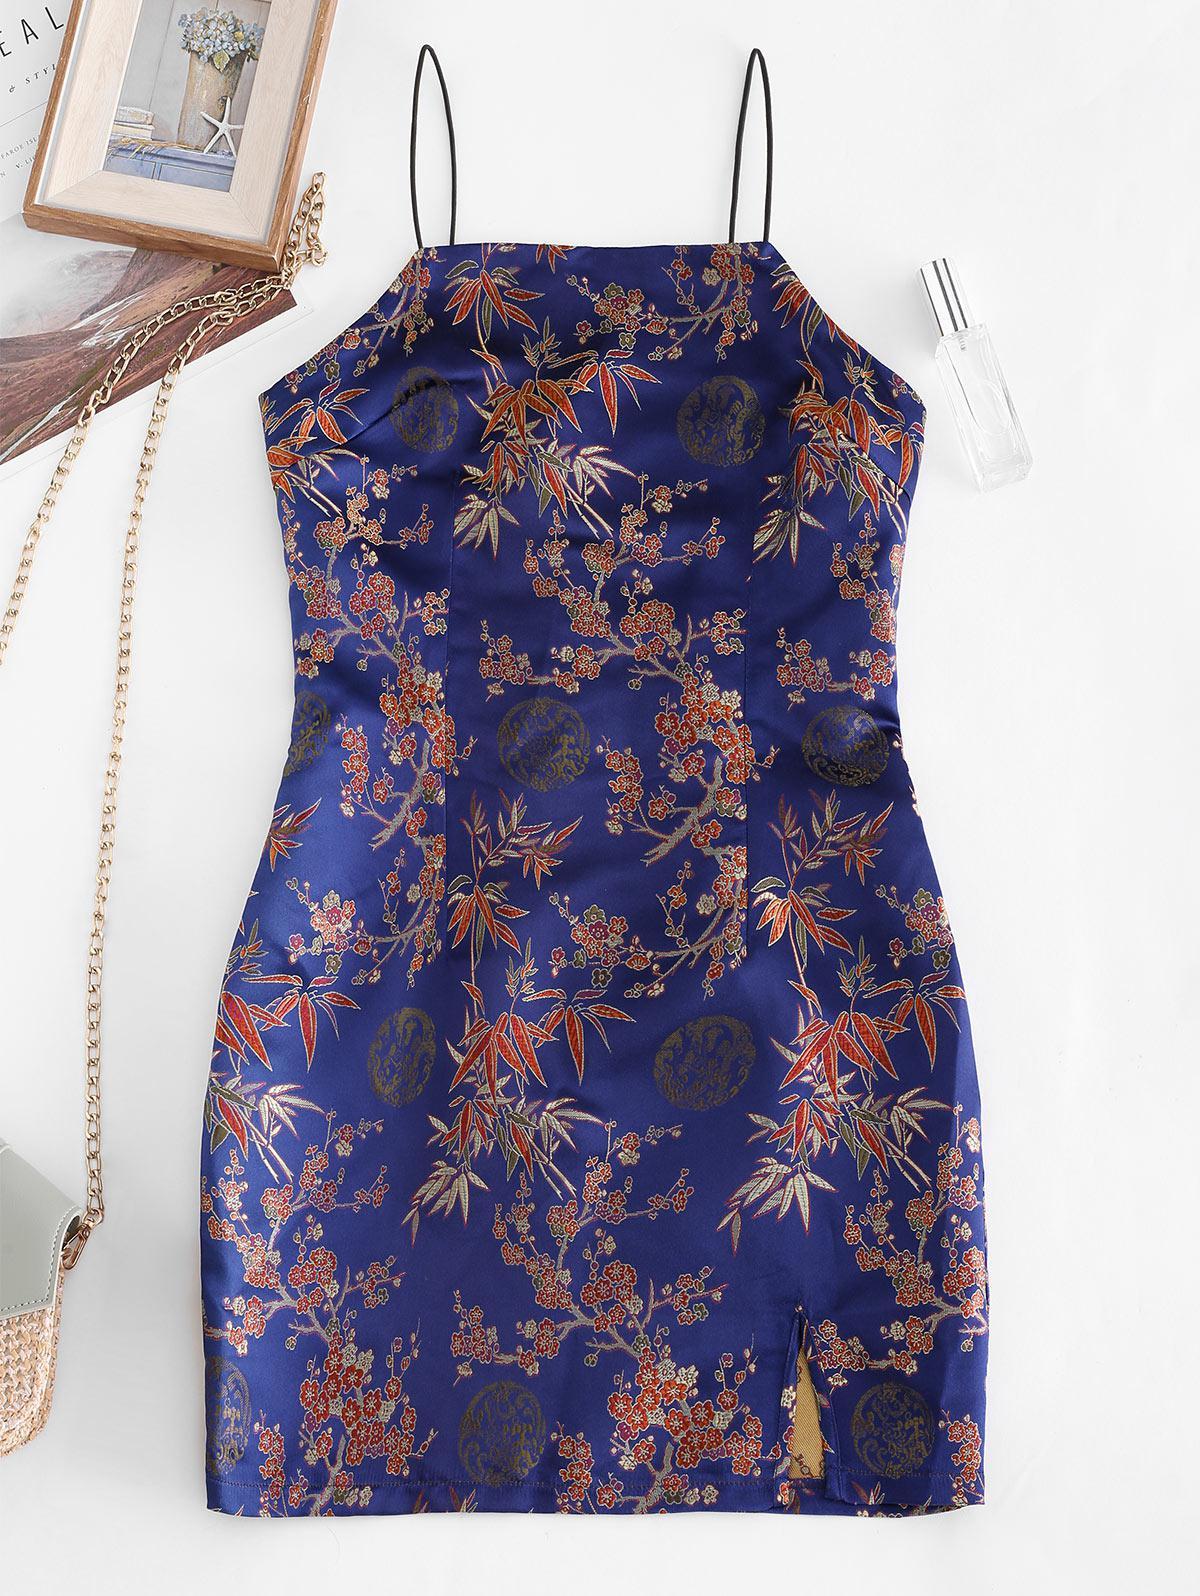 ZAFUL Plum Blossom Jacquard Oriental Cami Slit Dress